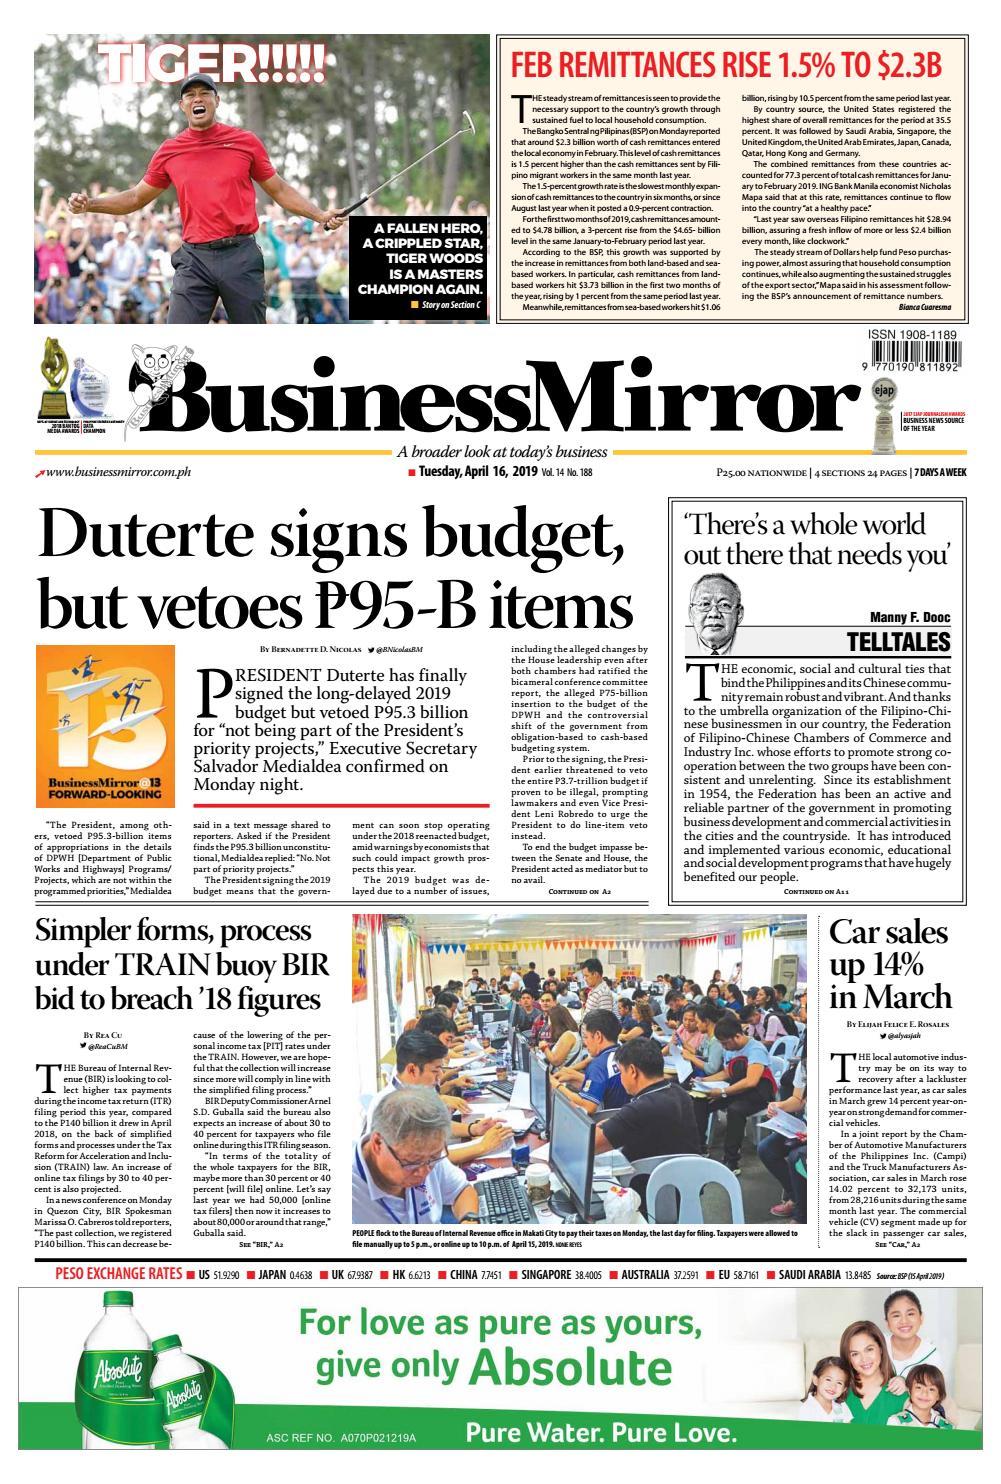 BusinessMirror April 16, 2019 by BusinessMirror - issuu